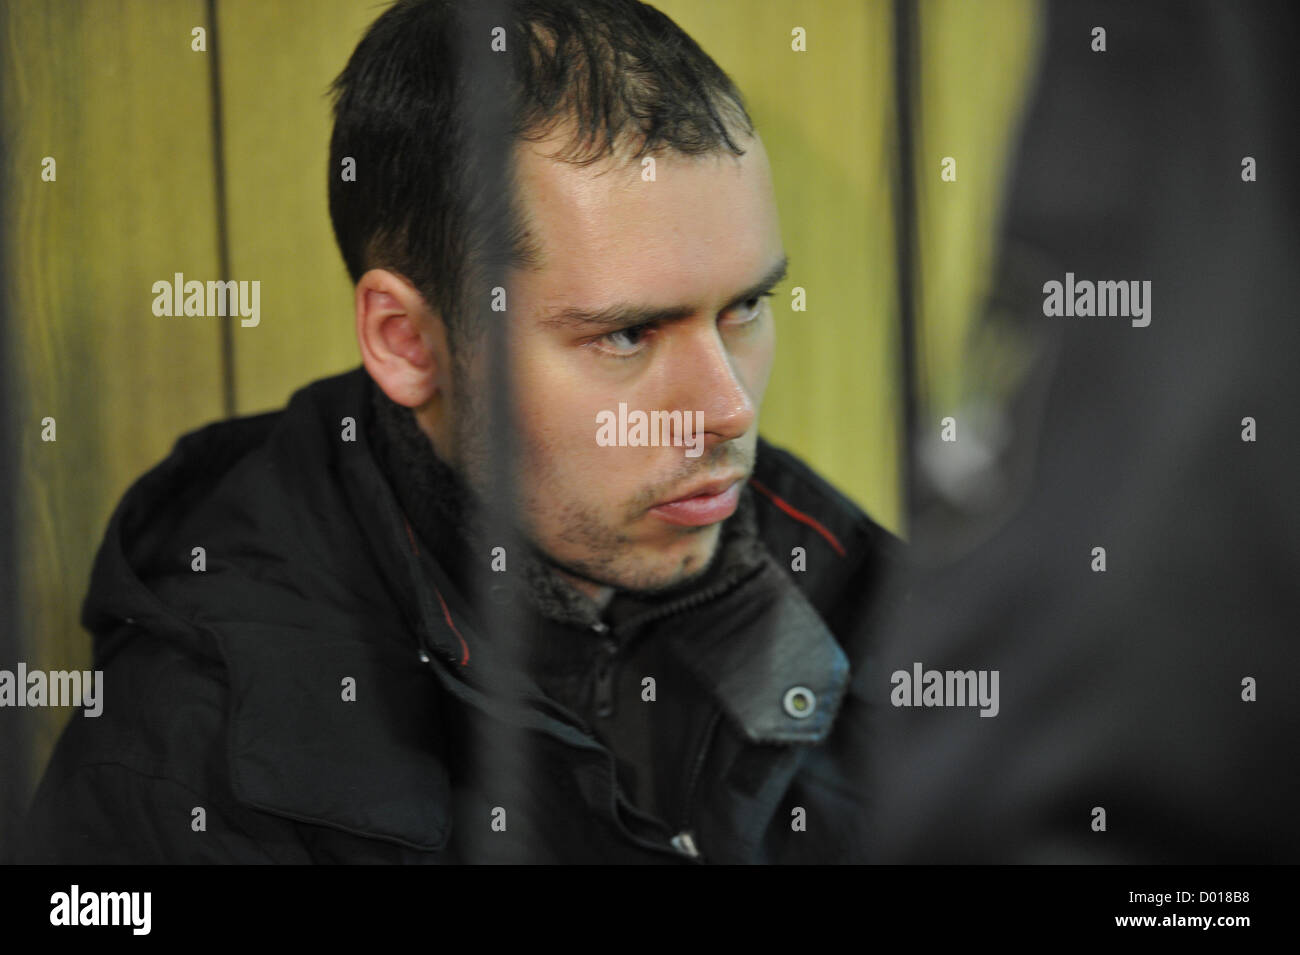 Nov. 8, 2012 - Moscow, Russia - Pictured: Dmitri Vinogradov - a man dubbed the 'Russian Breivik' in Babushkinsky - Stock Image